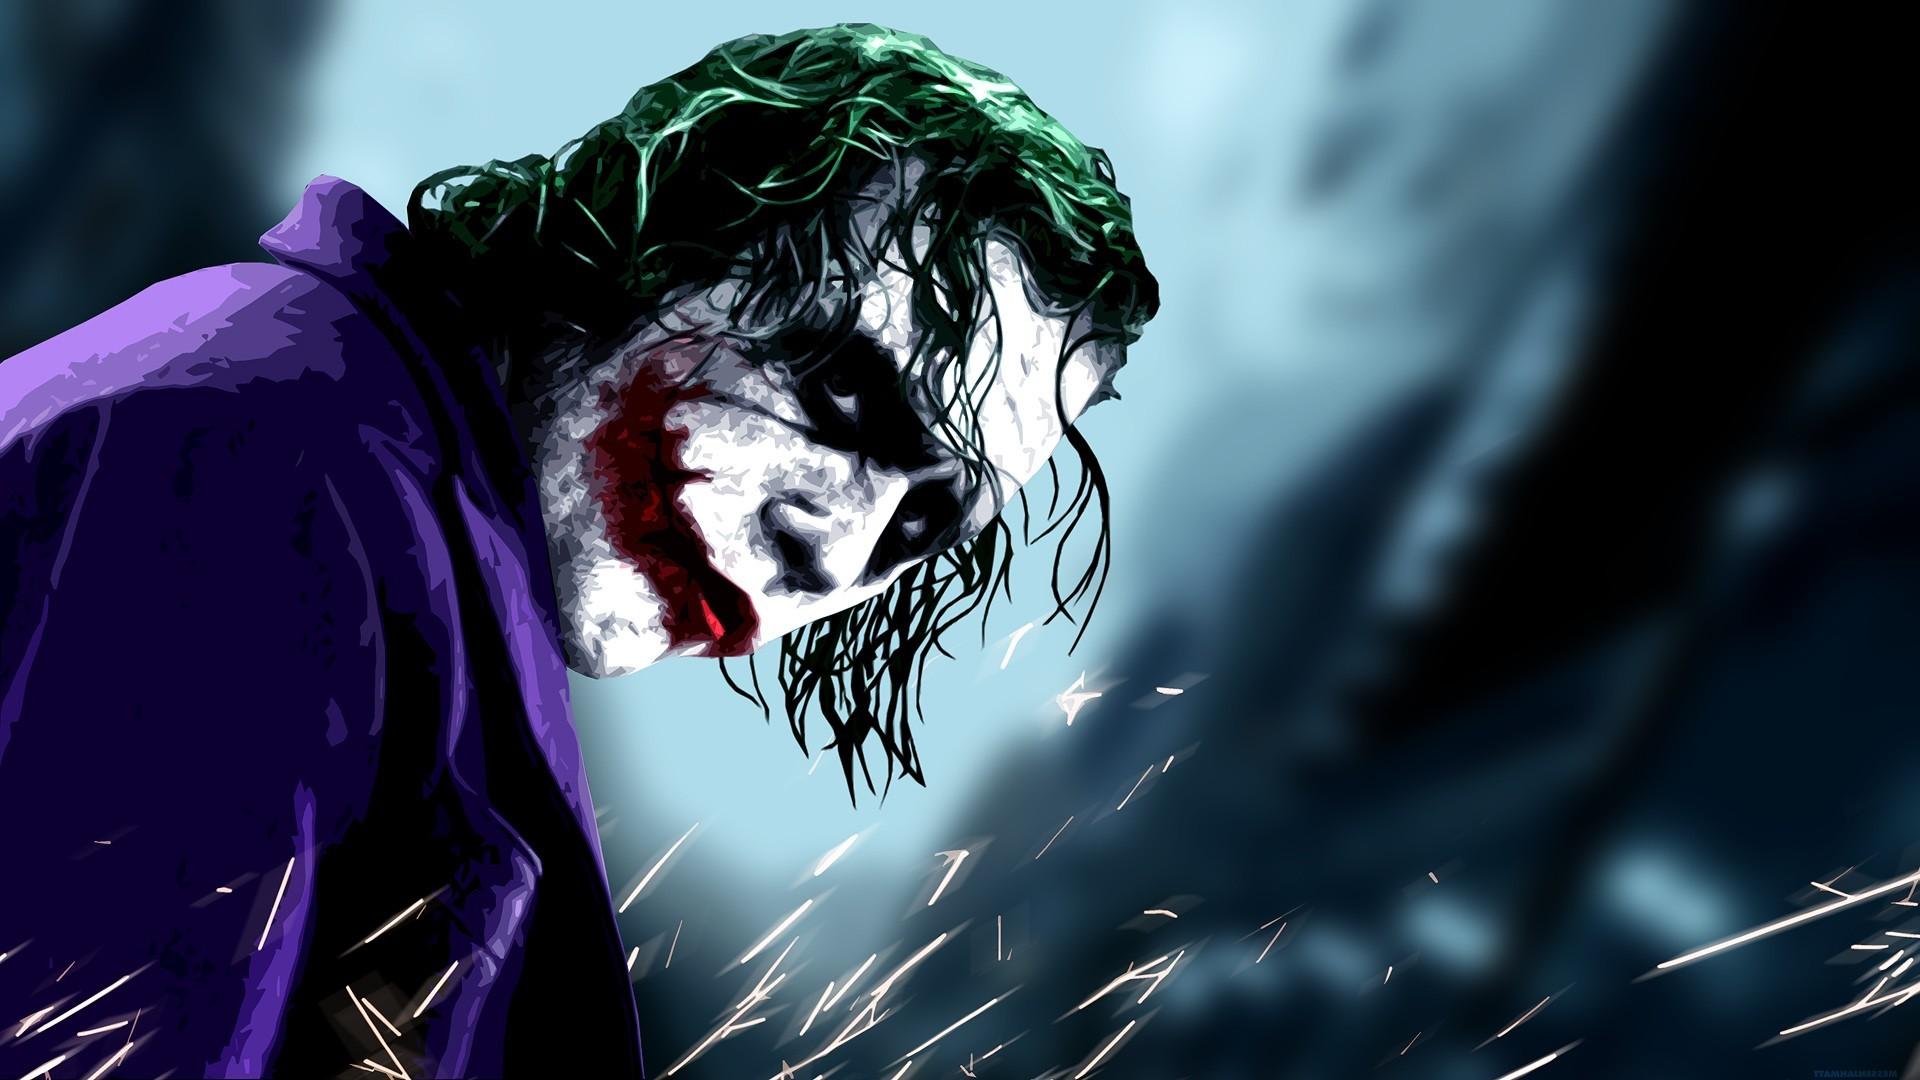 Wallpaper 1920x1080 Px Batman Joker Messenjahmatt